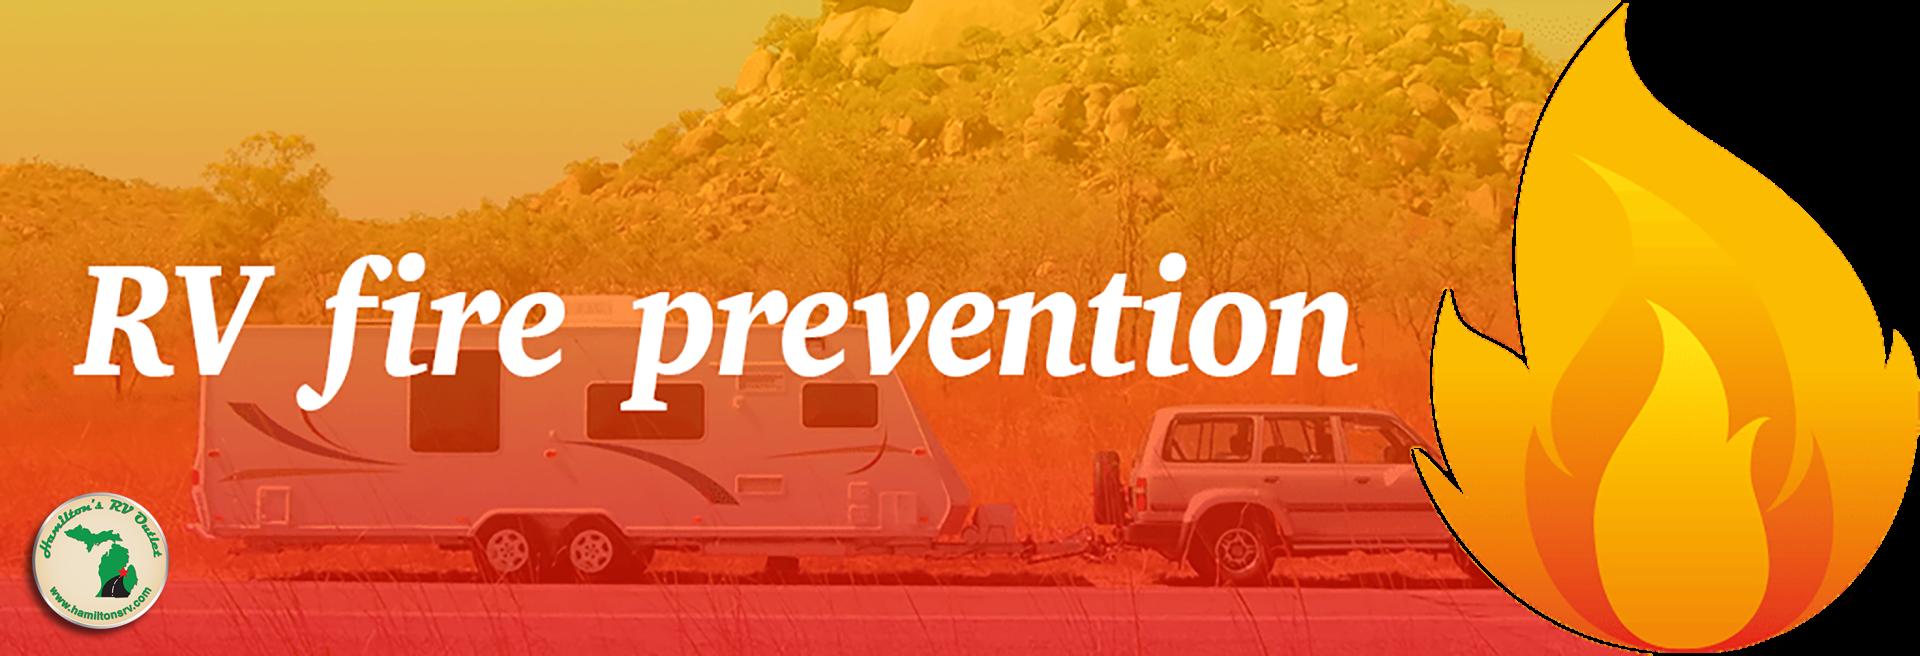 RV fire prevention Banner